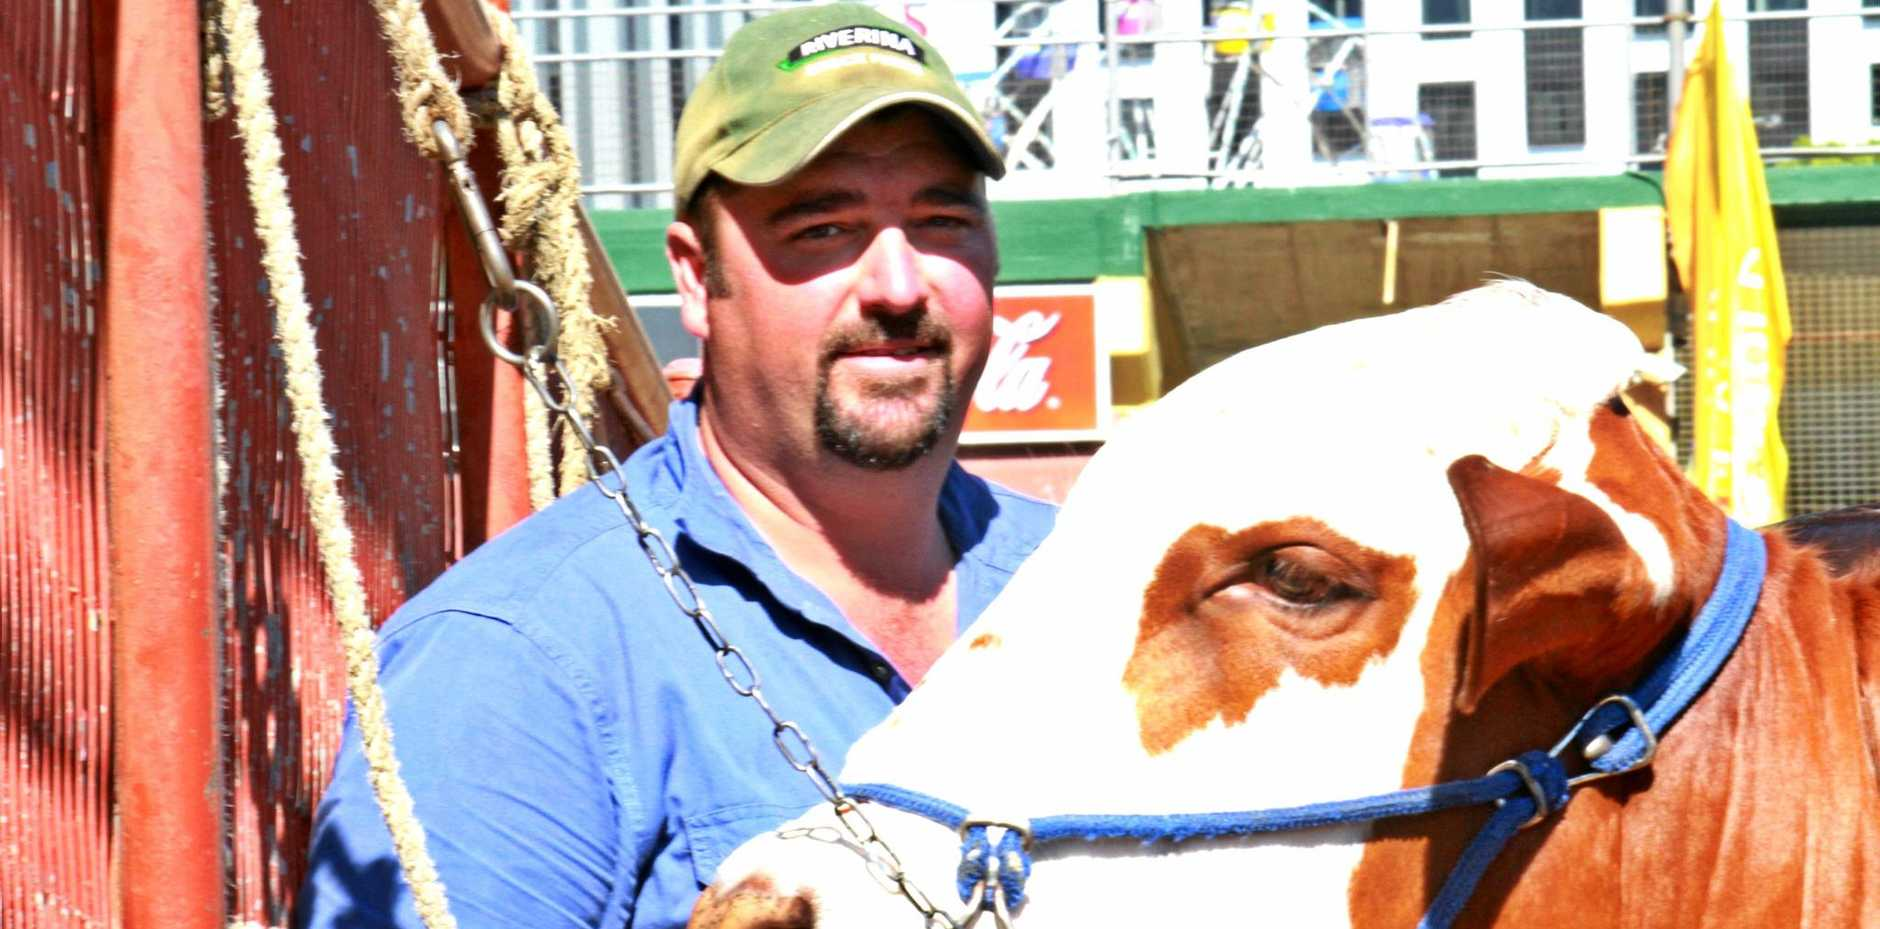 Northern Rivers Braford breeder Cameron Bennett enjoys the Ekka sunshine and atmosphere.